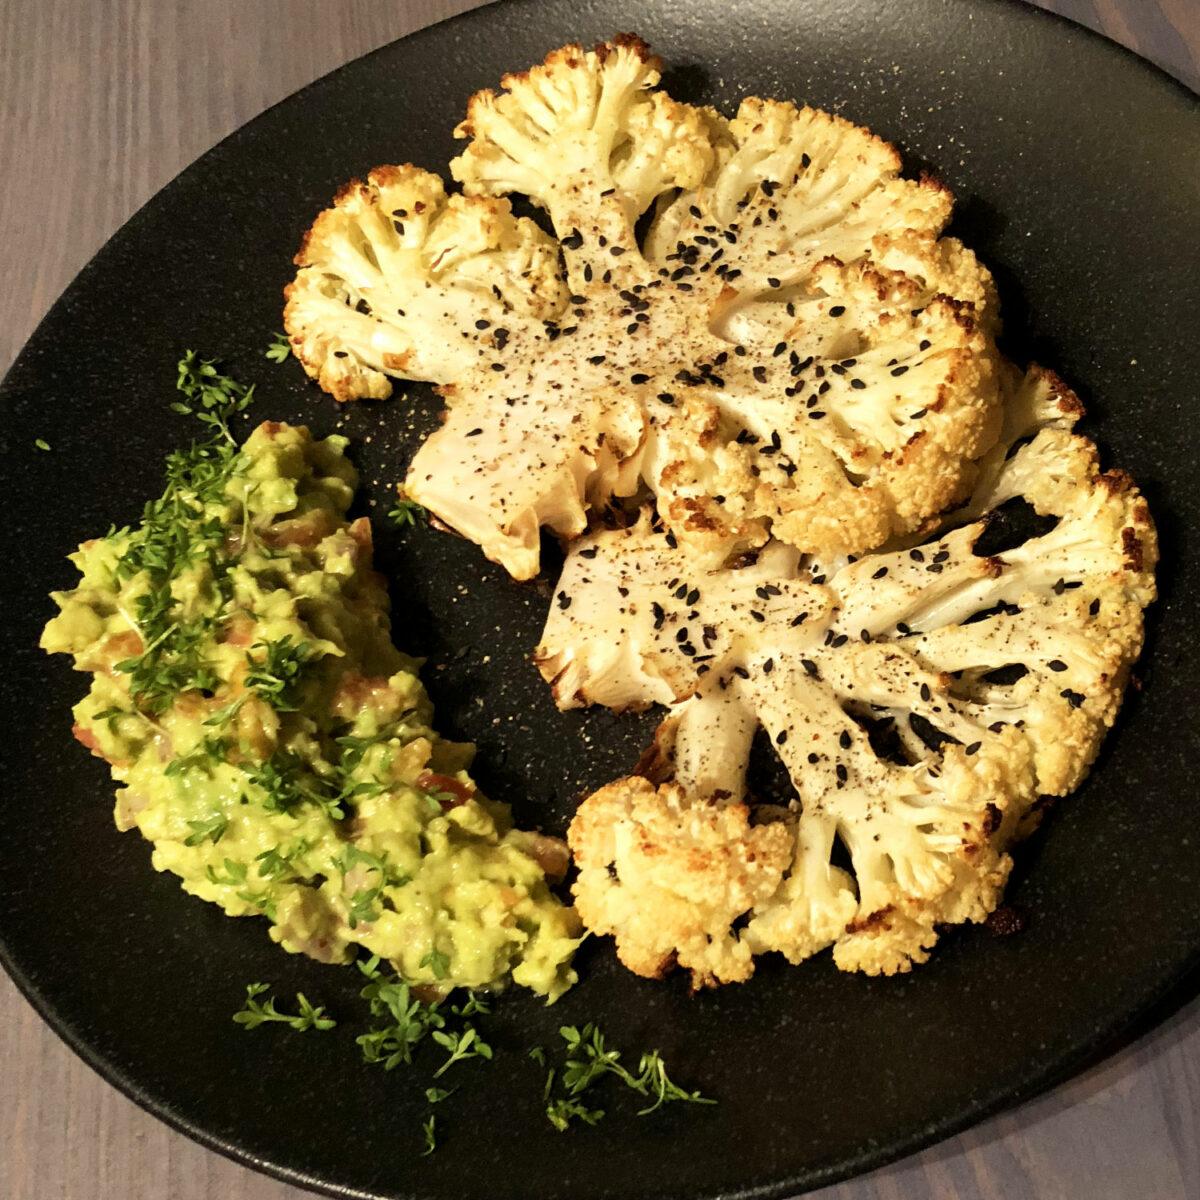 Gerösteter Blumenkohl mit Avocado-Dip